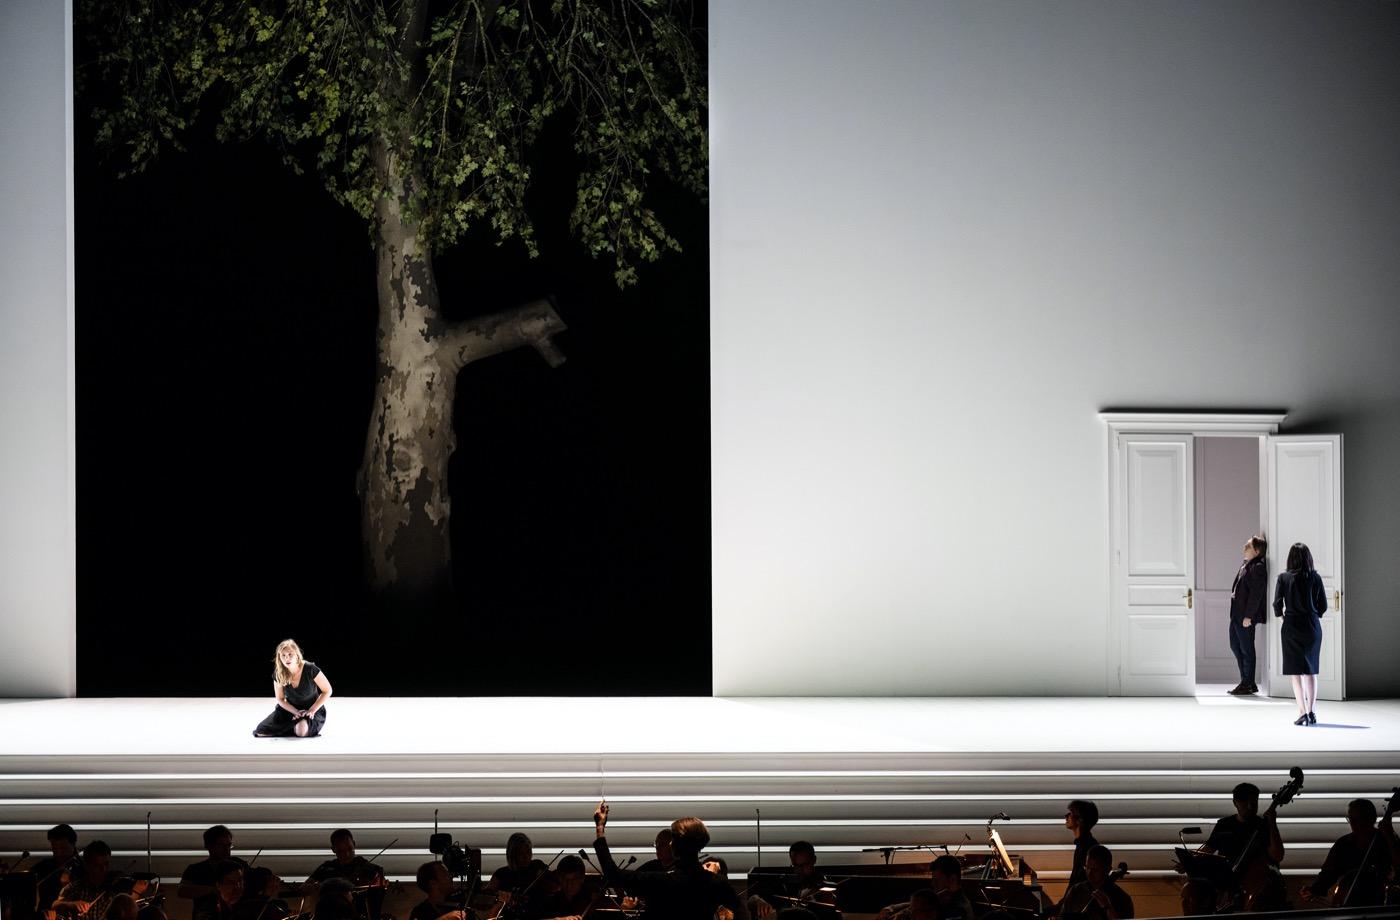 Leiacker-Loy-Cosi-Fan-Tutte-Monika-Rittershaus-Salzburger-Festspiele-2020-00115